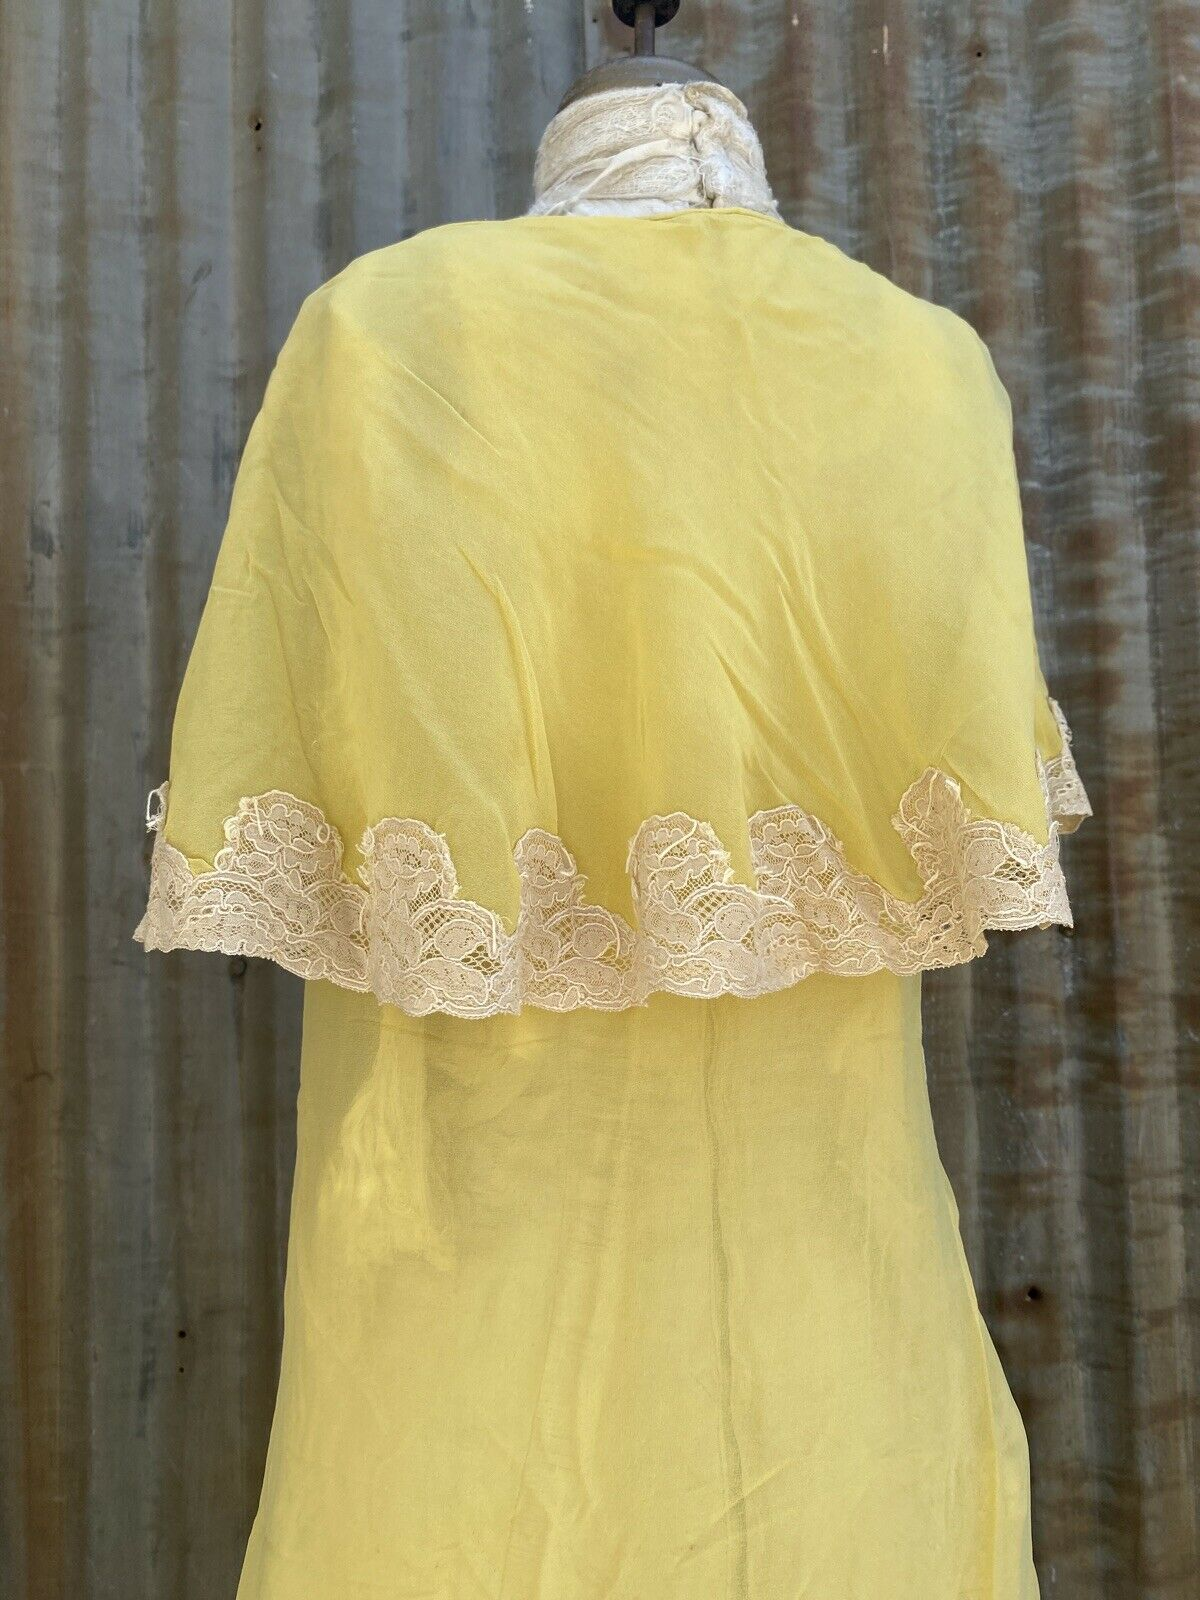 Antique 1920s 1930s Yellow Silk Chiffon Midi Dres… - image 11